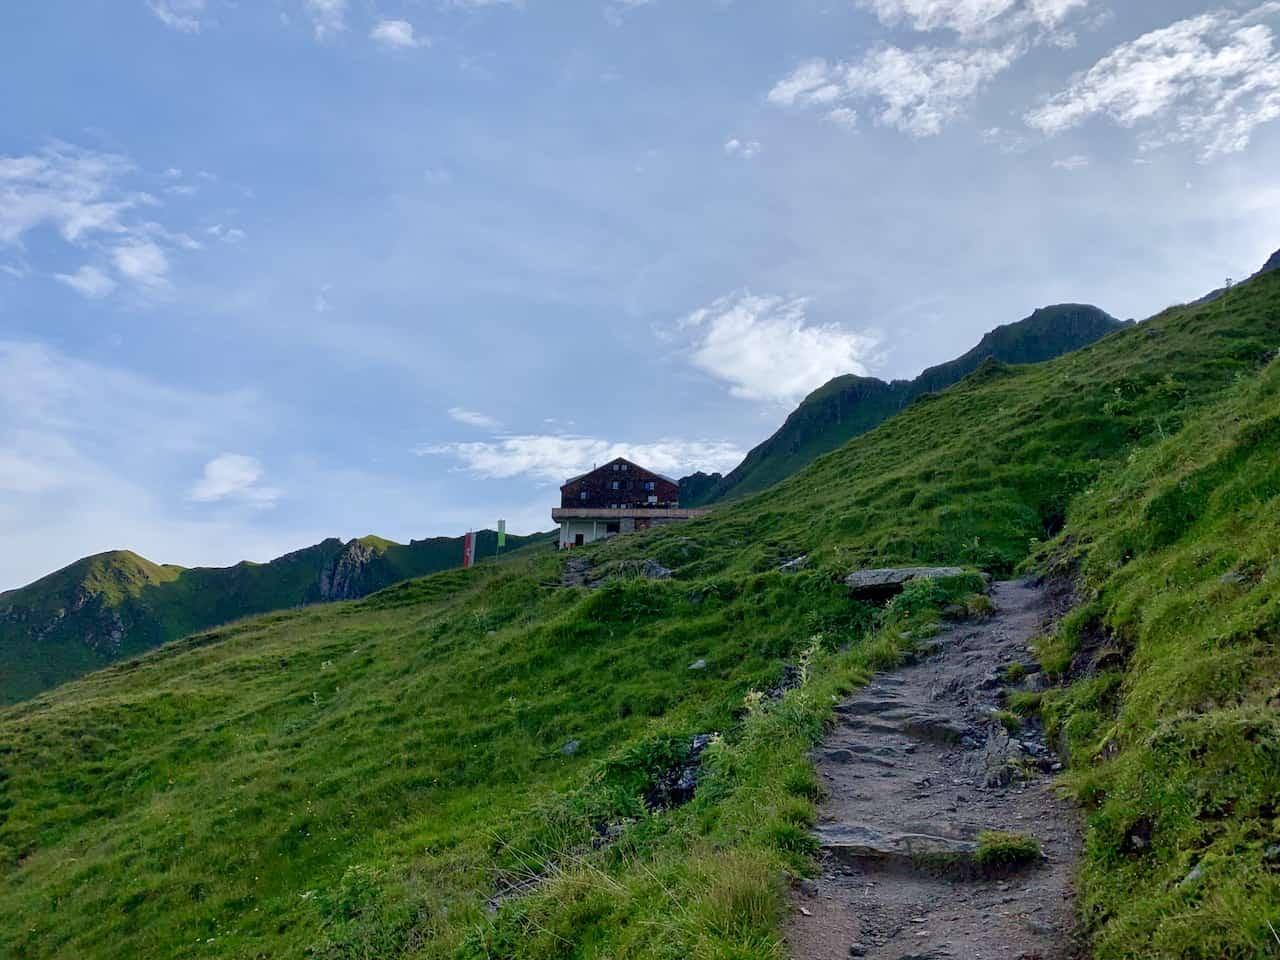 Edelhutte Mayrhofen